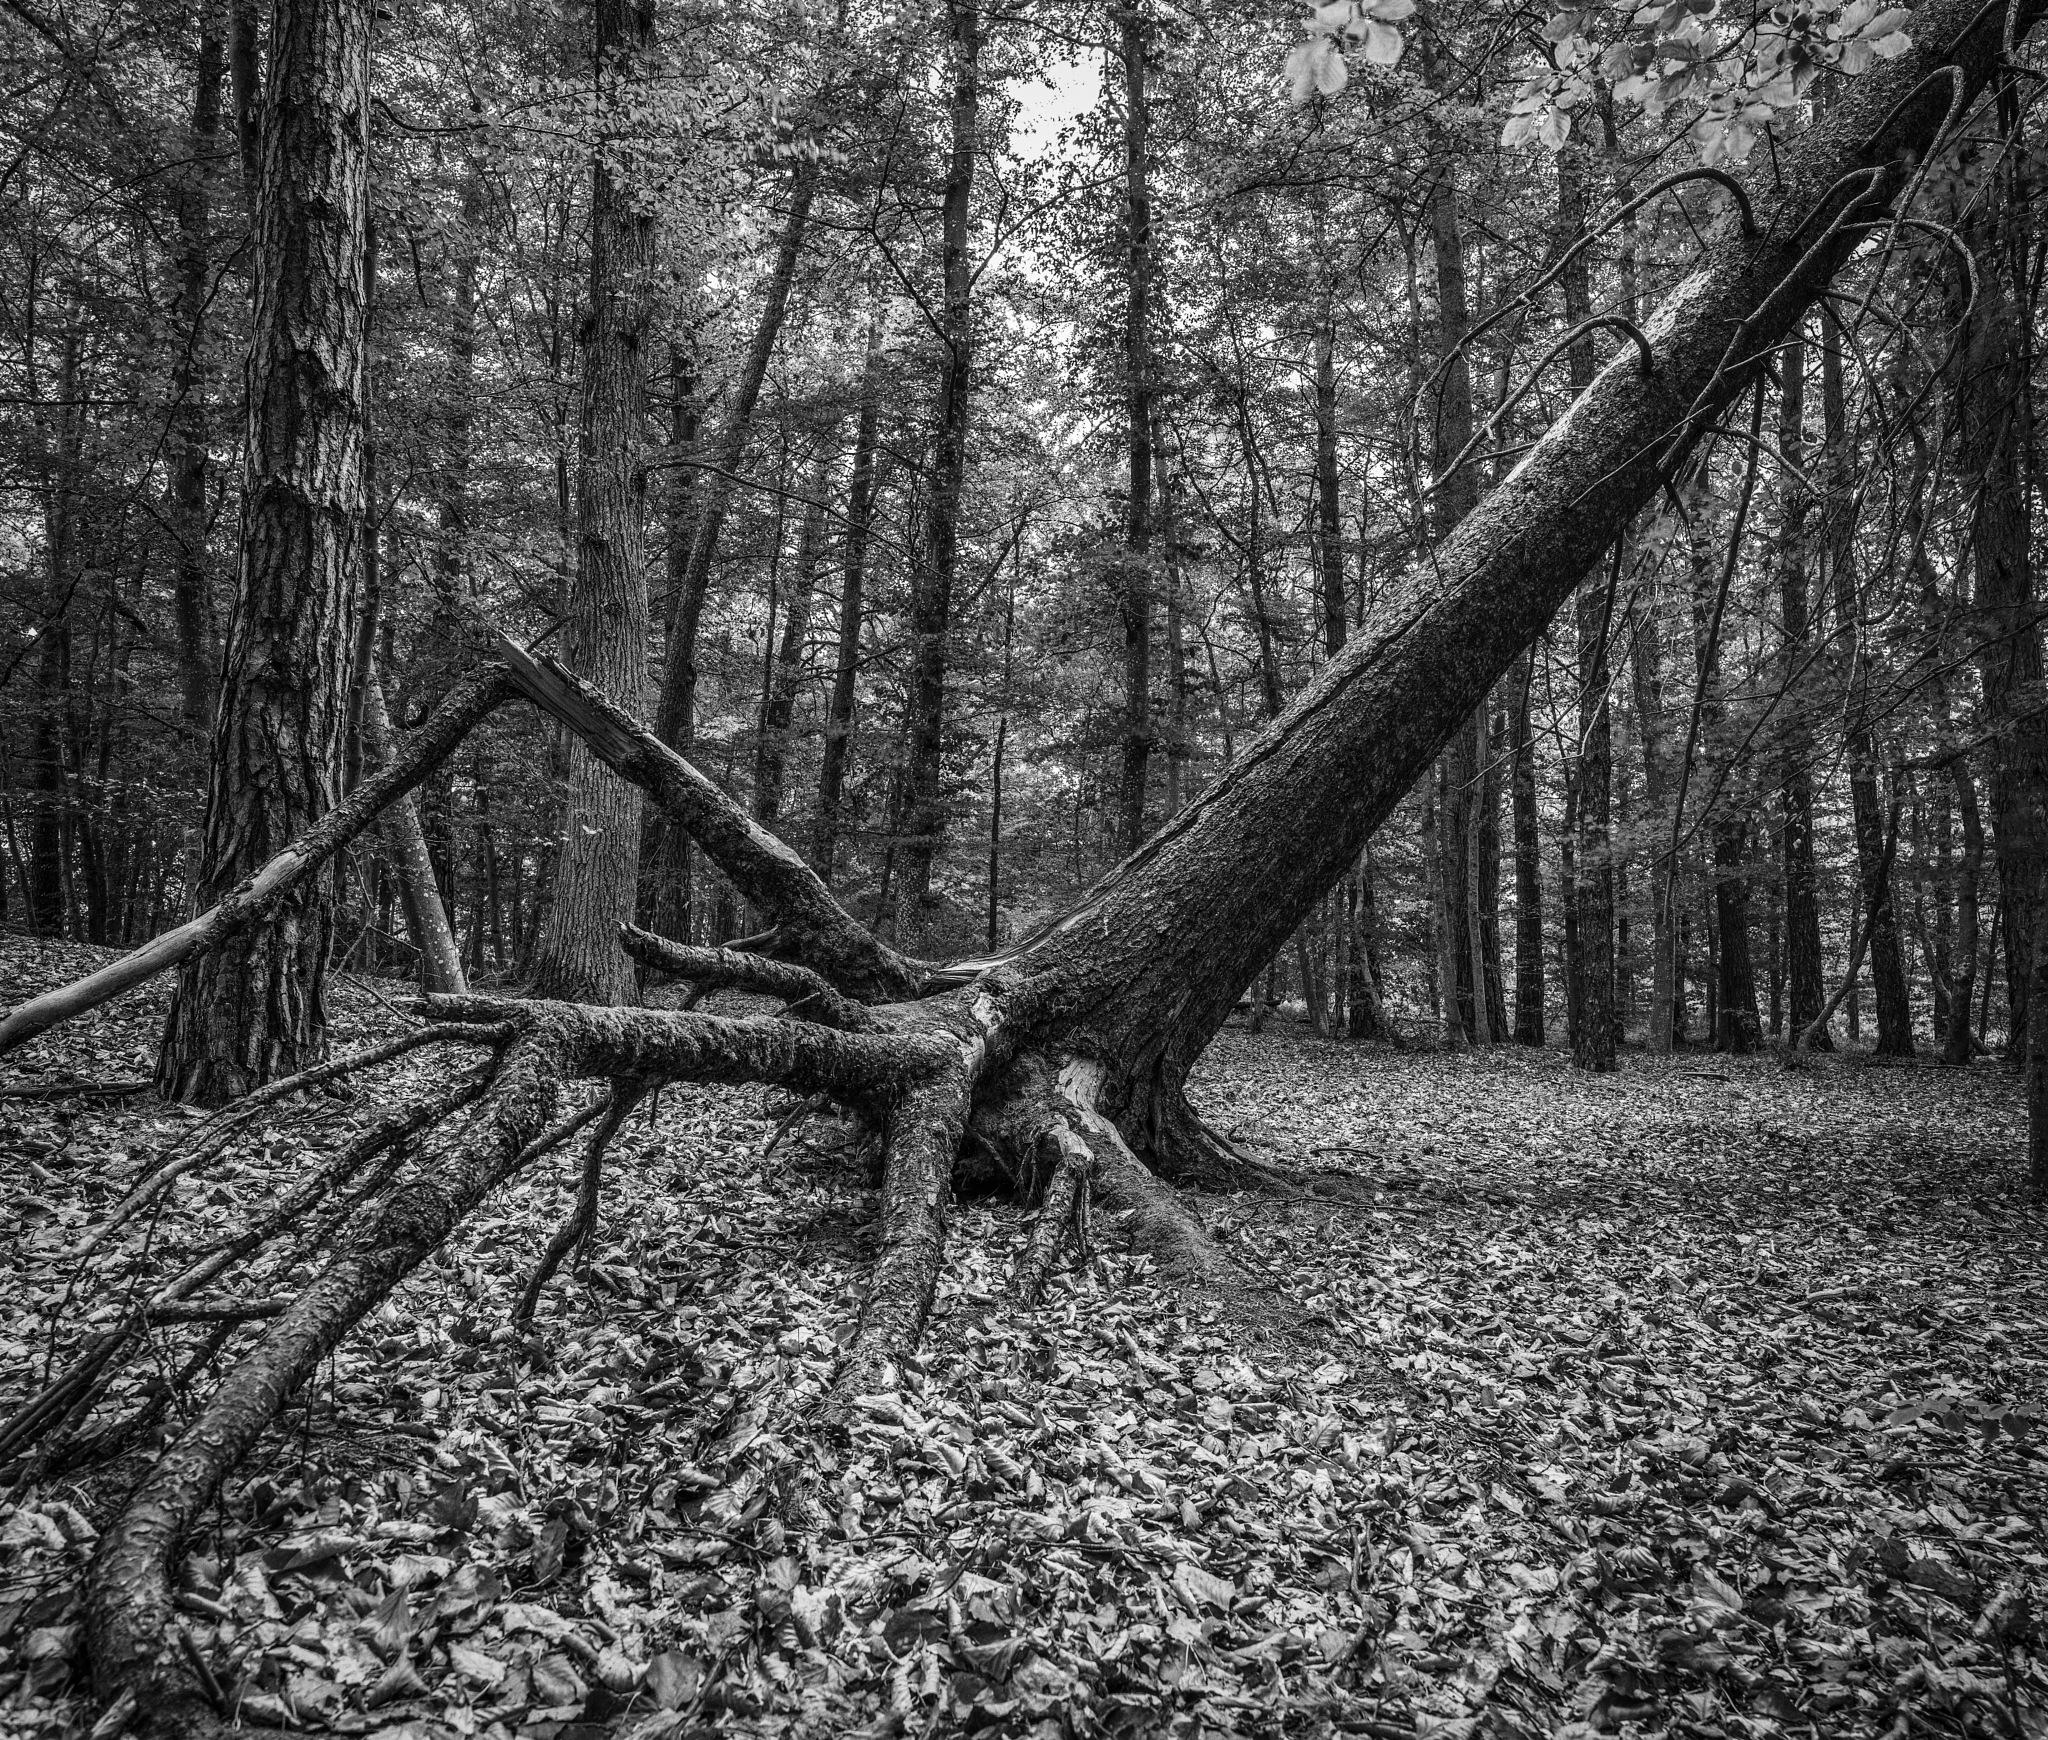 fallen tree by hutchst